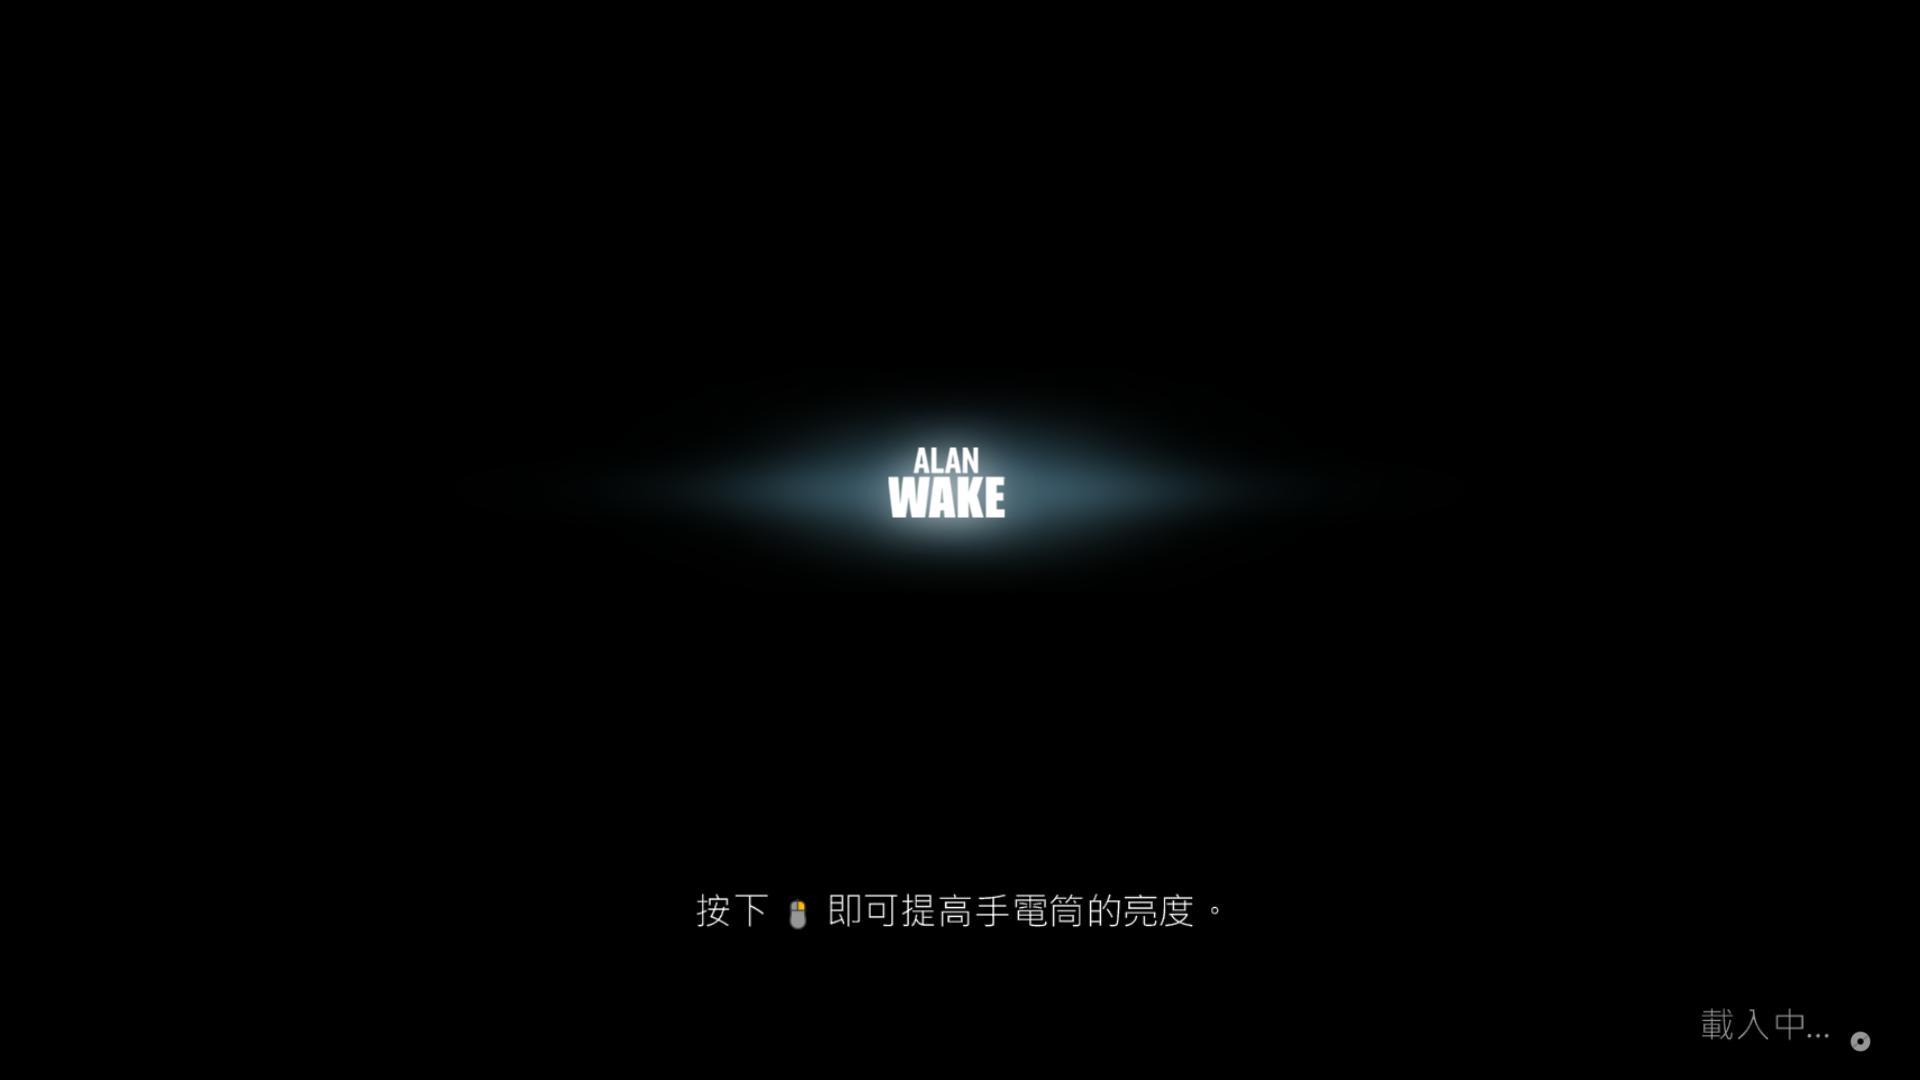 心灵杀手/阿兰醒醒 /Alan Wake插图1